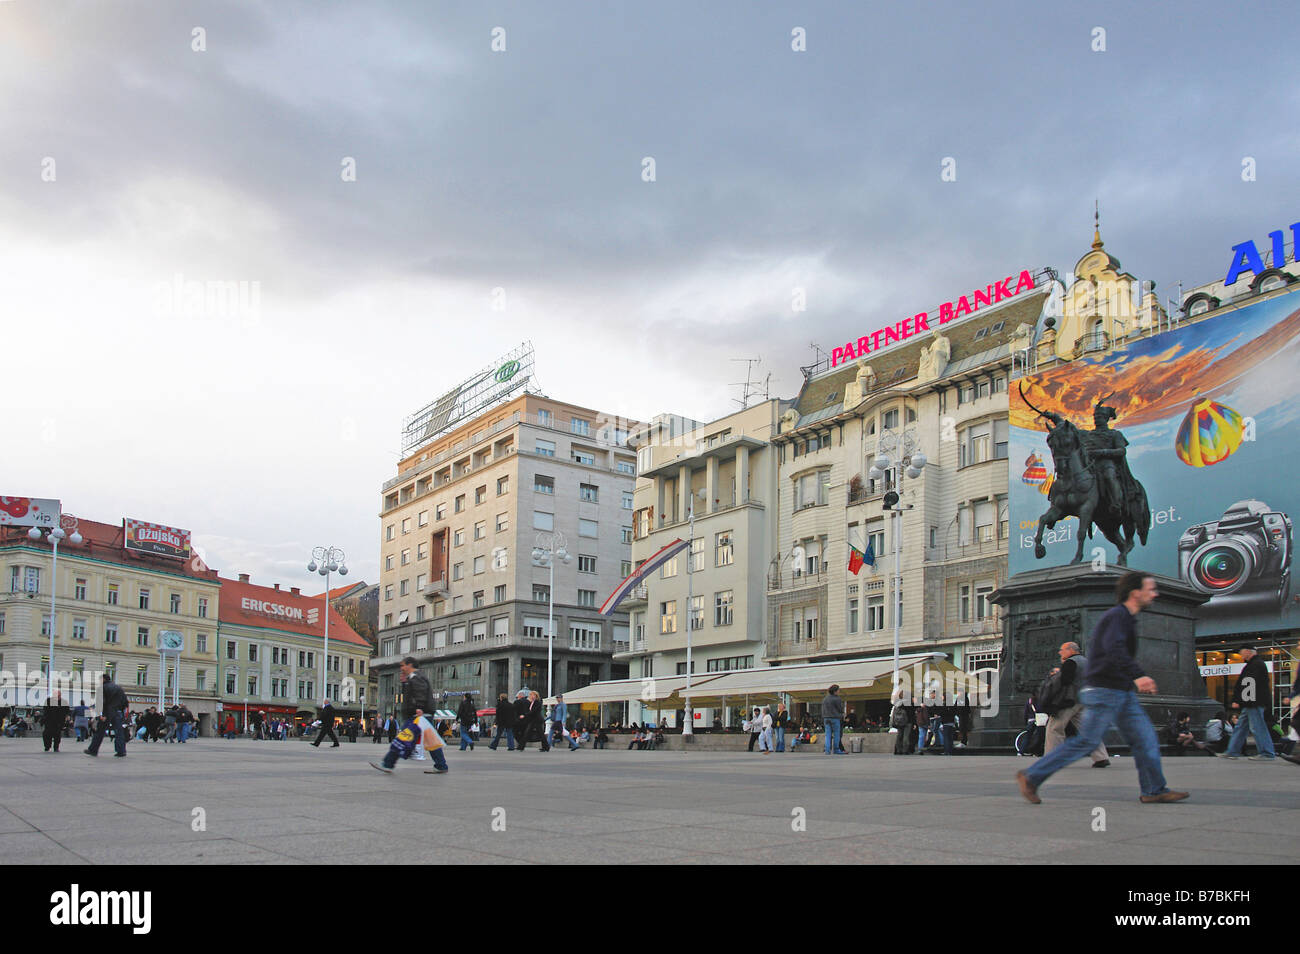 Ban Josip Jelacic main square Stock Photo